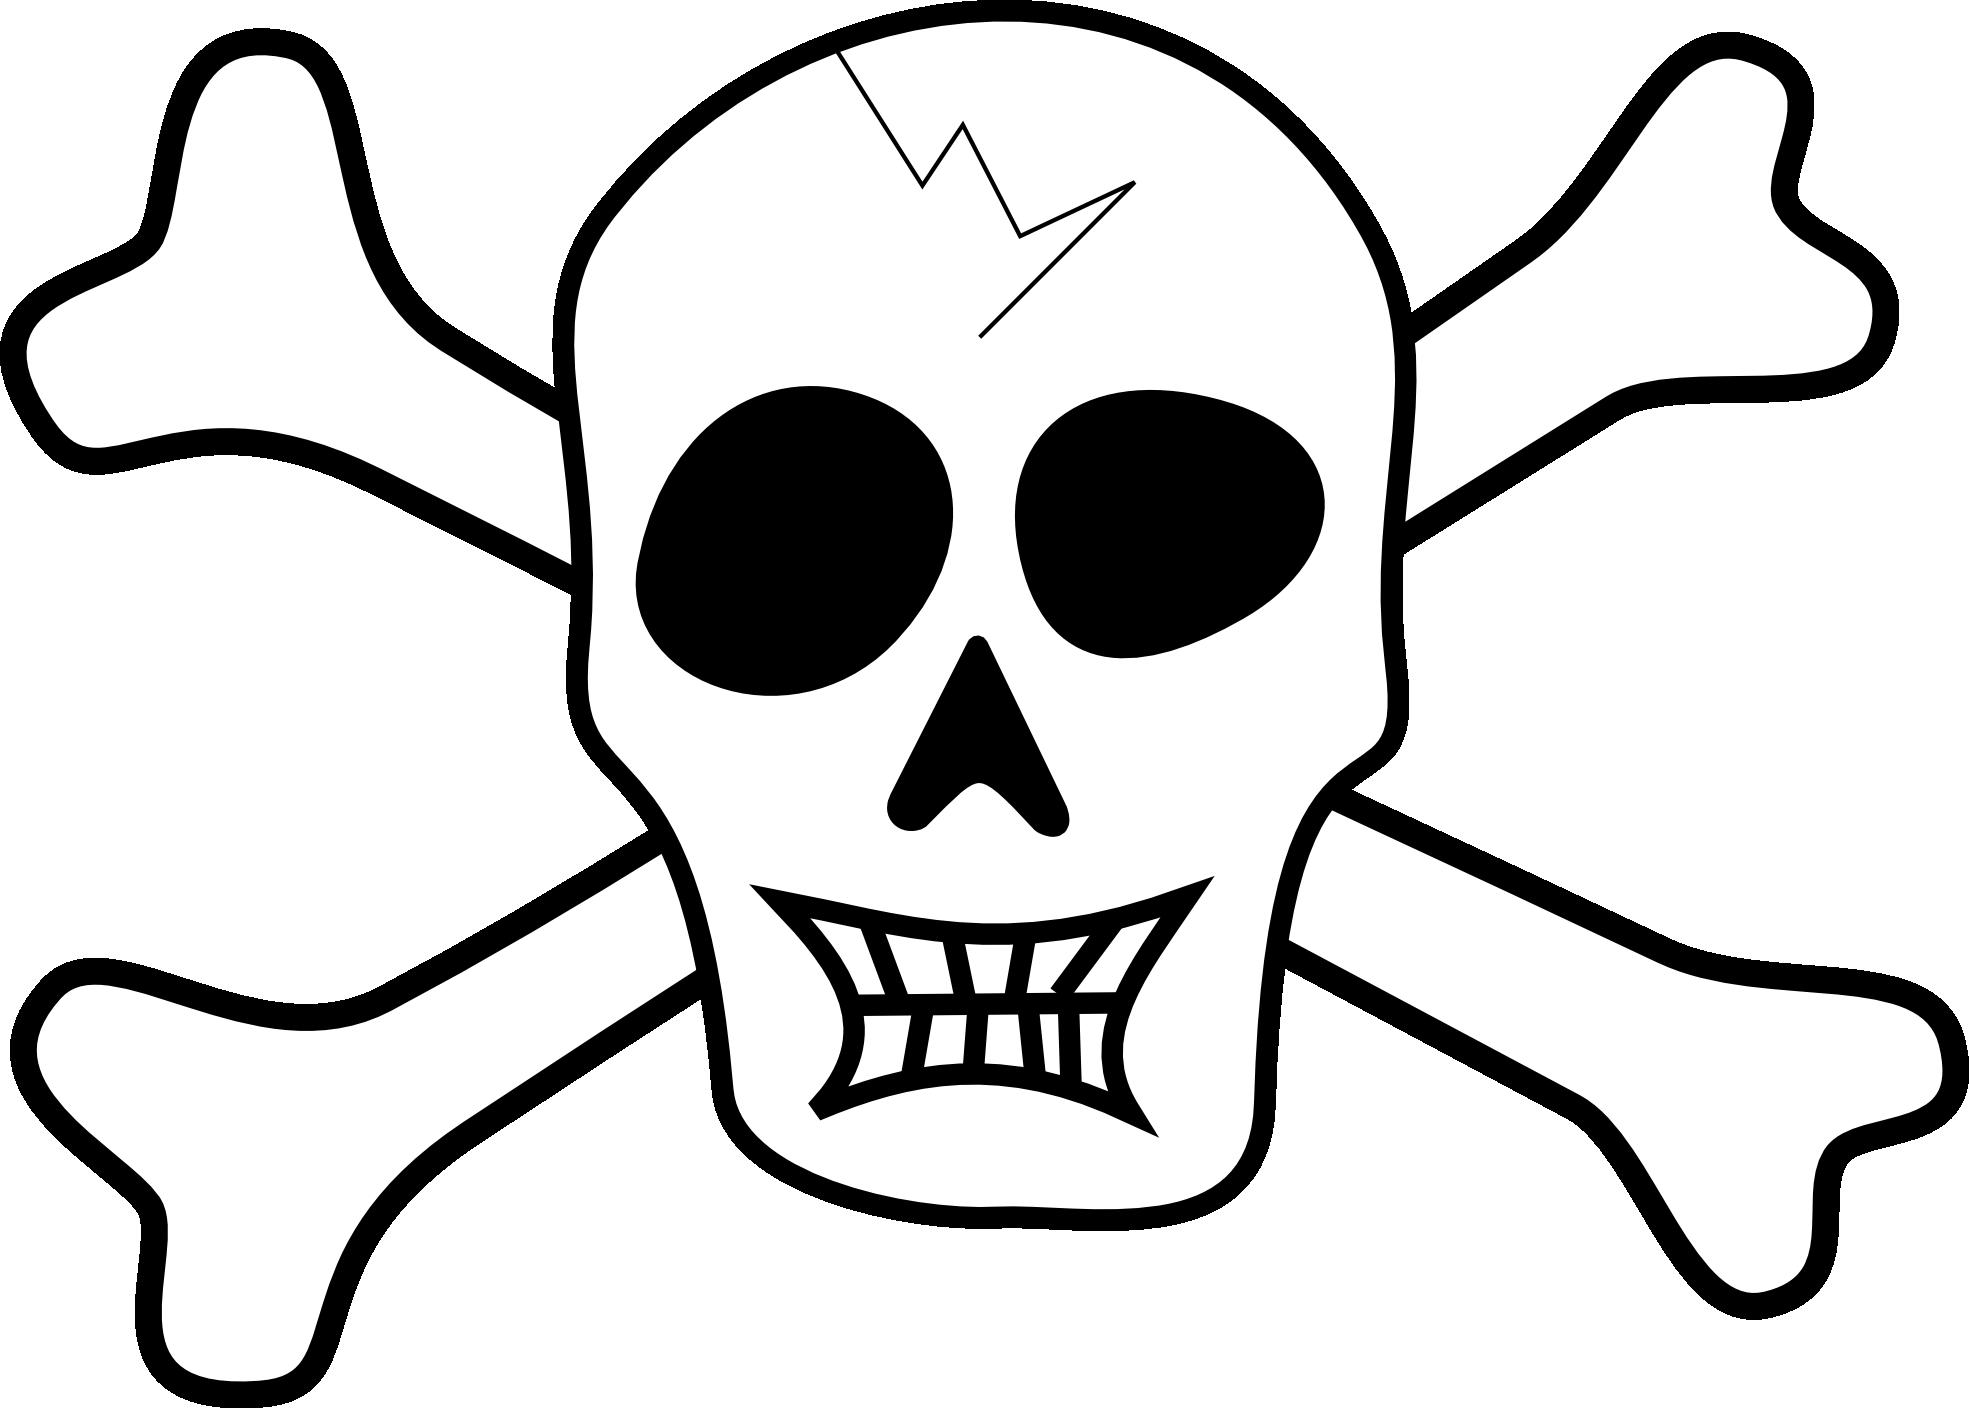 Halloween skull clipart picture royalty free clipartist.net » Clip Art » Tribut Pirate Skull Bones Halloween SVG picture royalty free